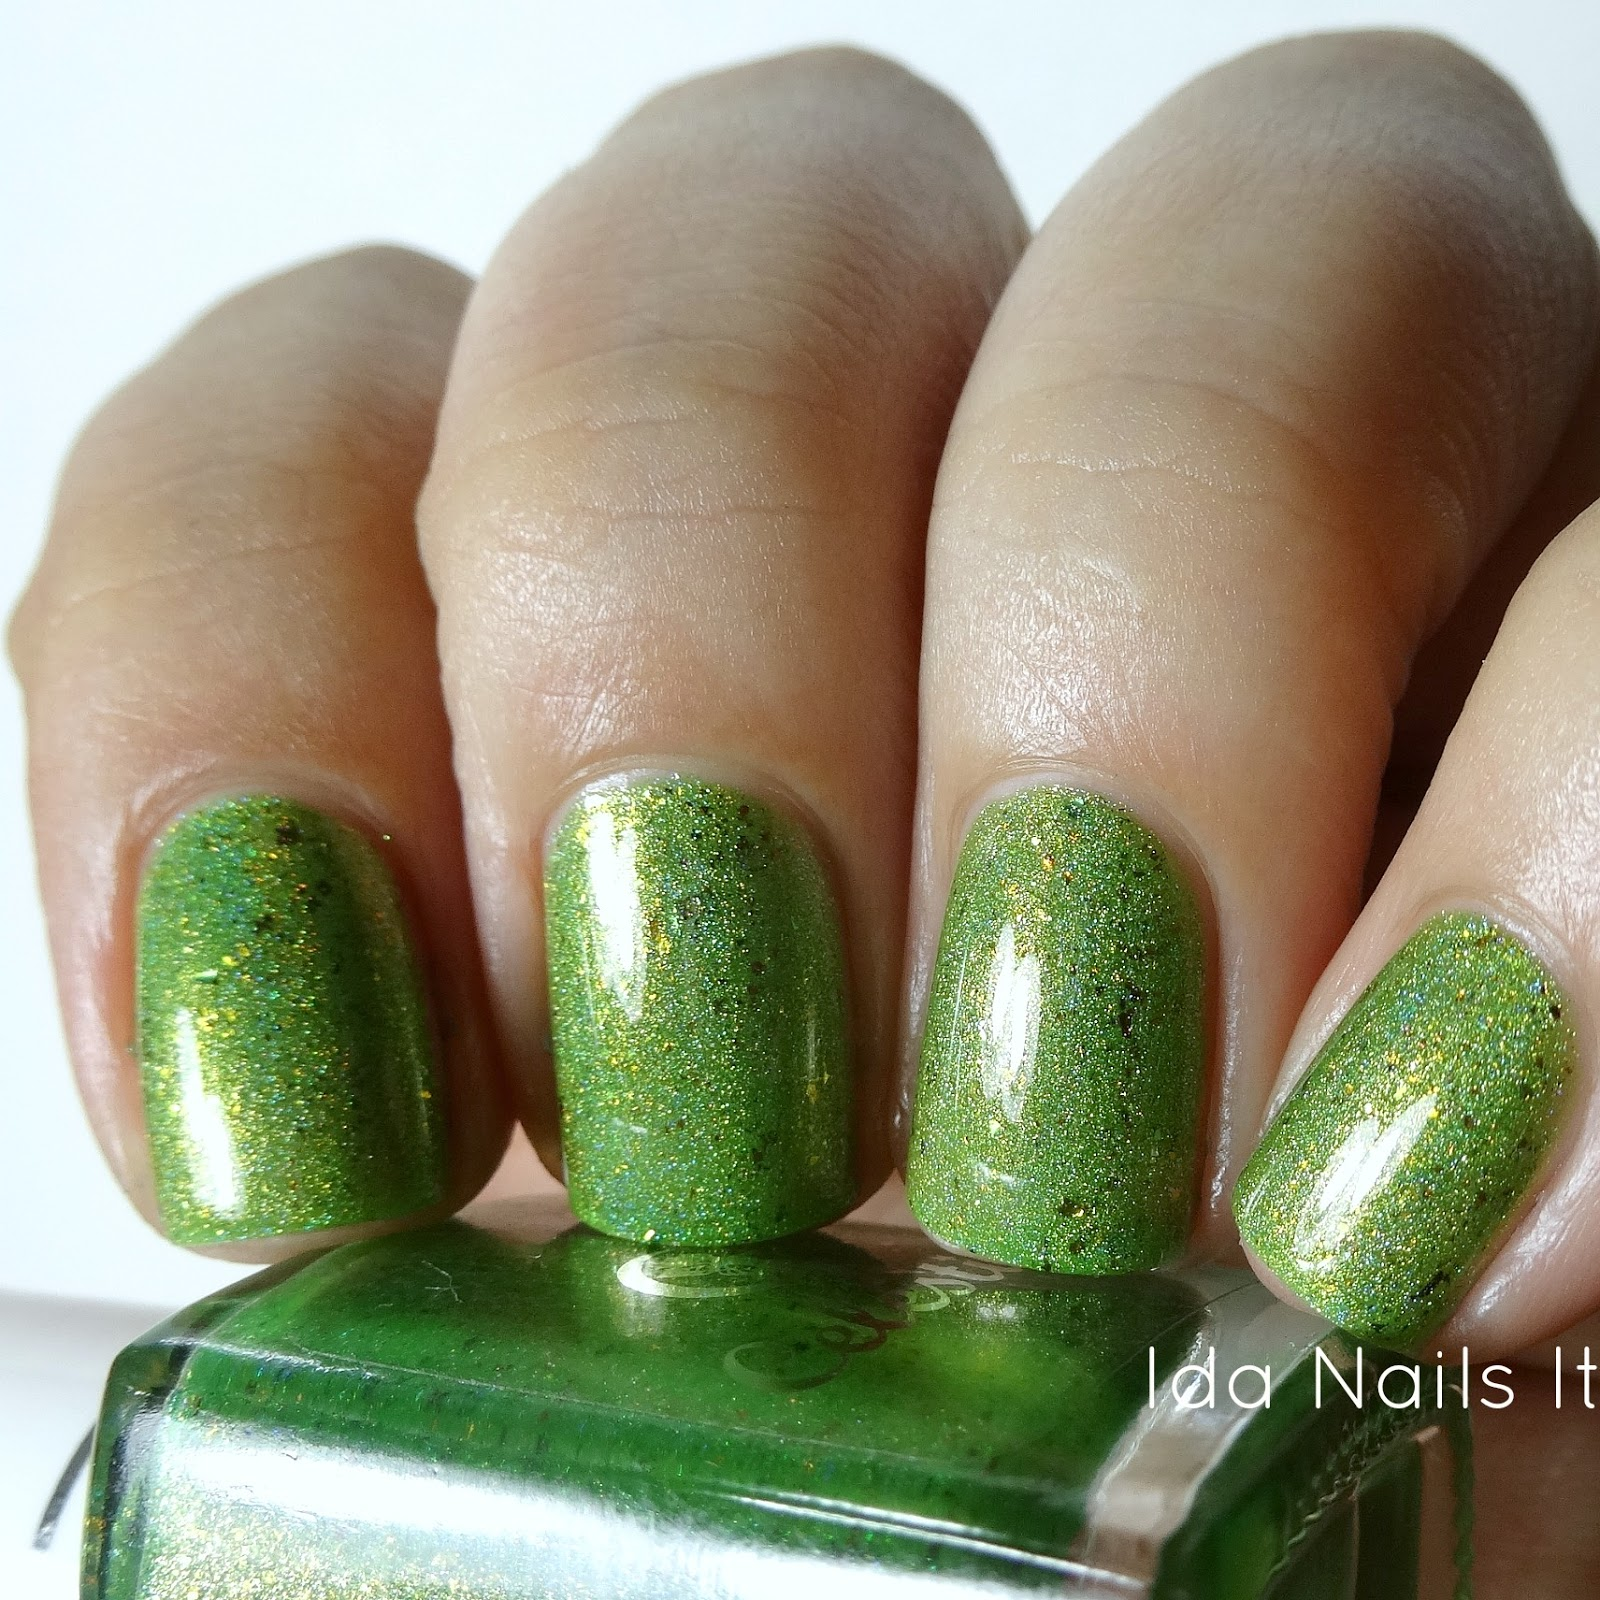 Ida Nails It: Celestial Cosmetics Pun-tastic Collection plus June LE ...